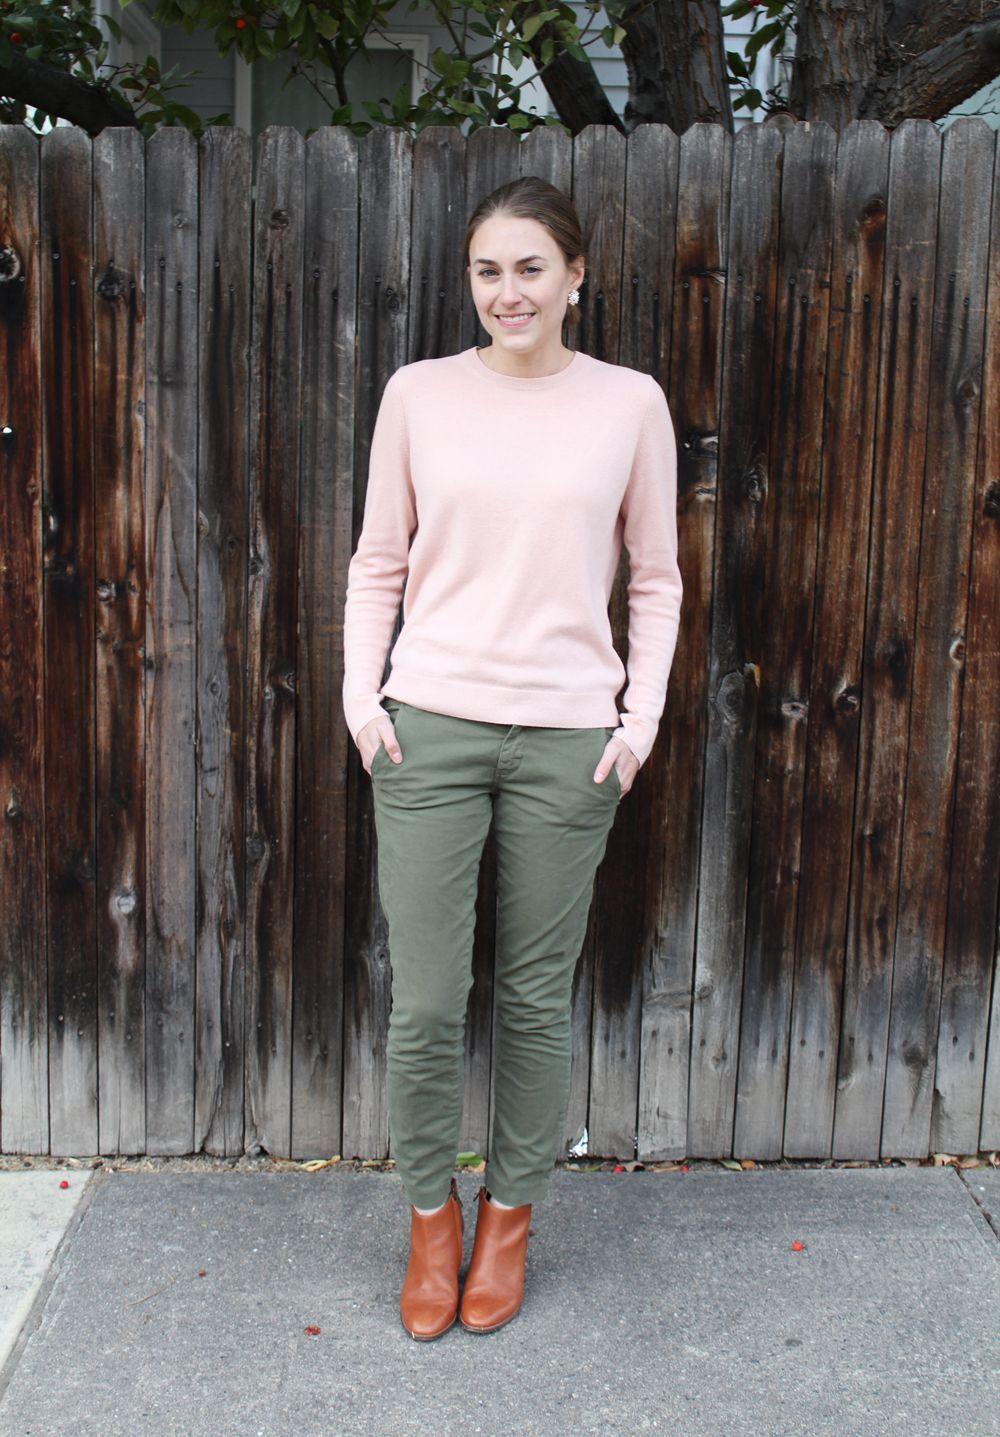 db4e7f1a762 pink sweater + olive green pants